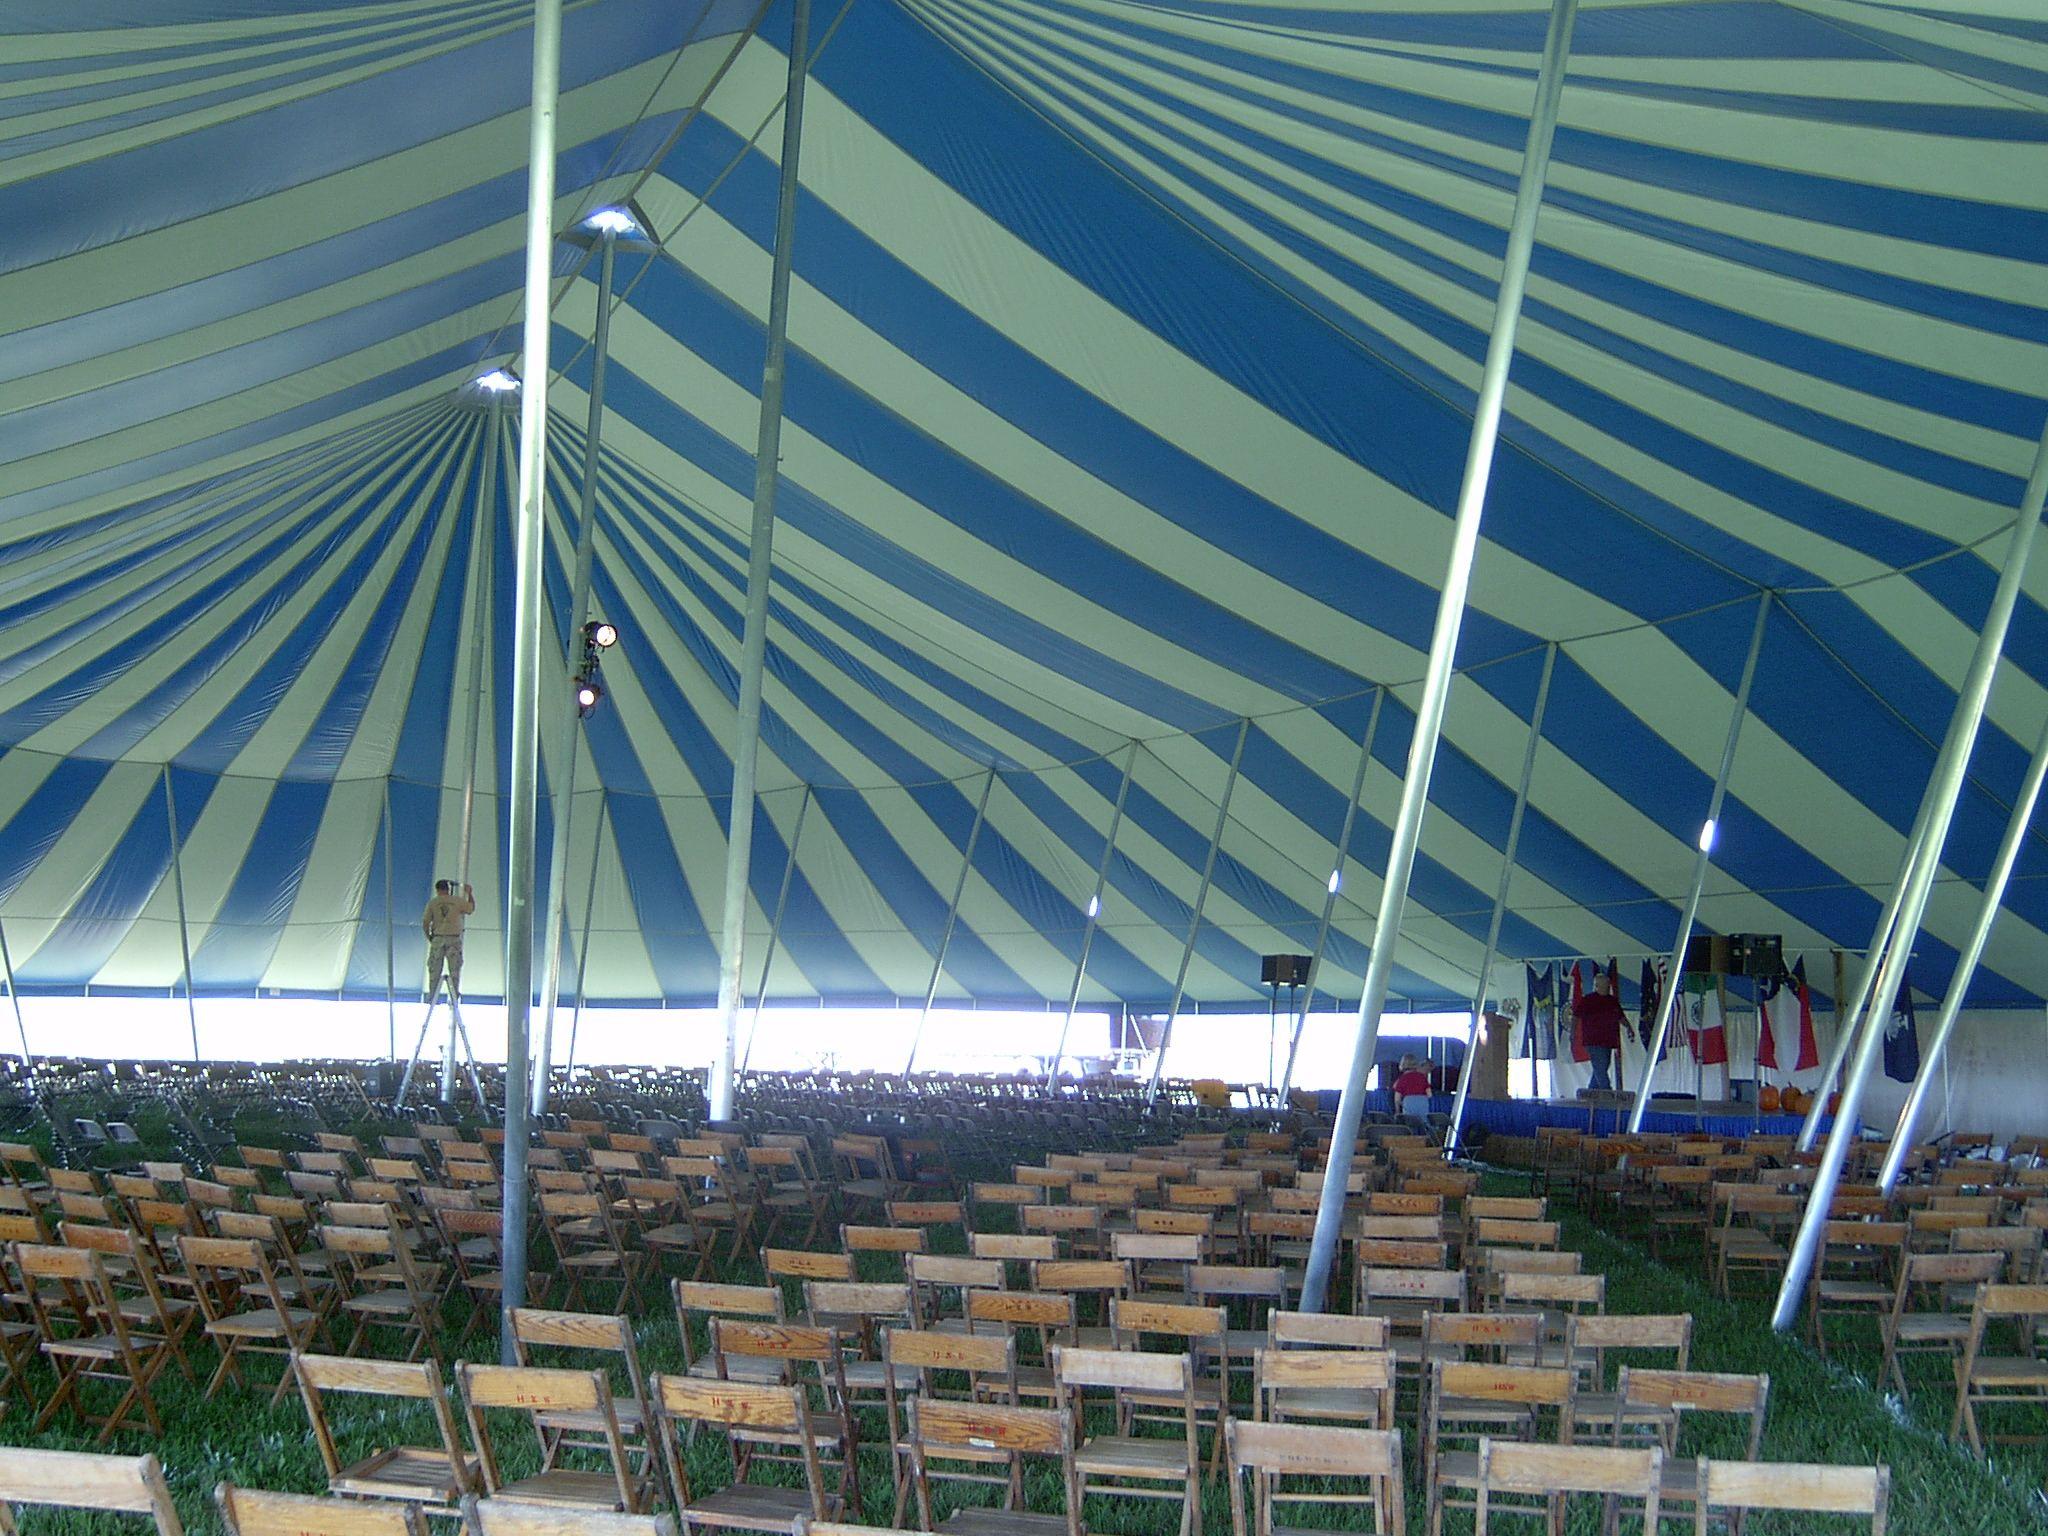 Tent manufacturer of 18 oz premium 125u0027 x 173u0027 oval pole ... & Tent manufacturer of 18 oz premium 125u0027 x 173u0027 oval pole tent ...